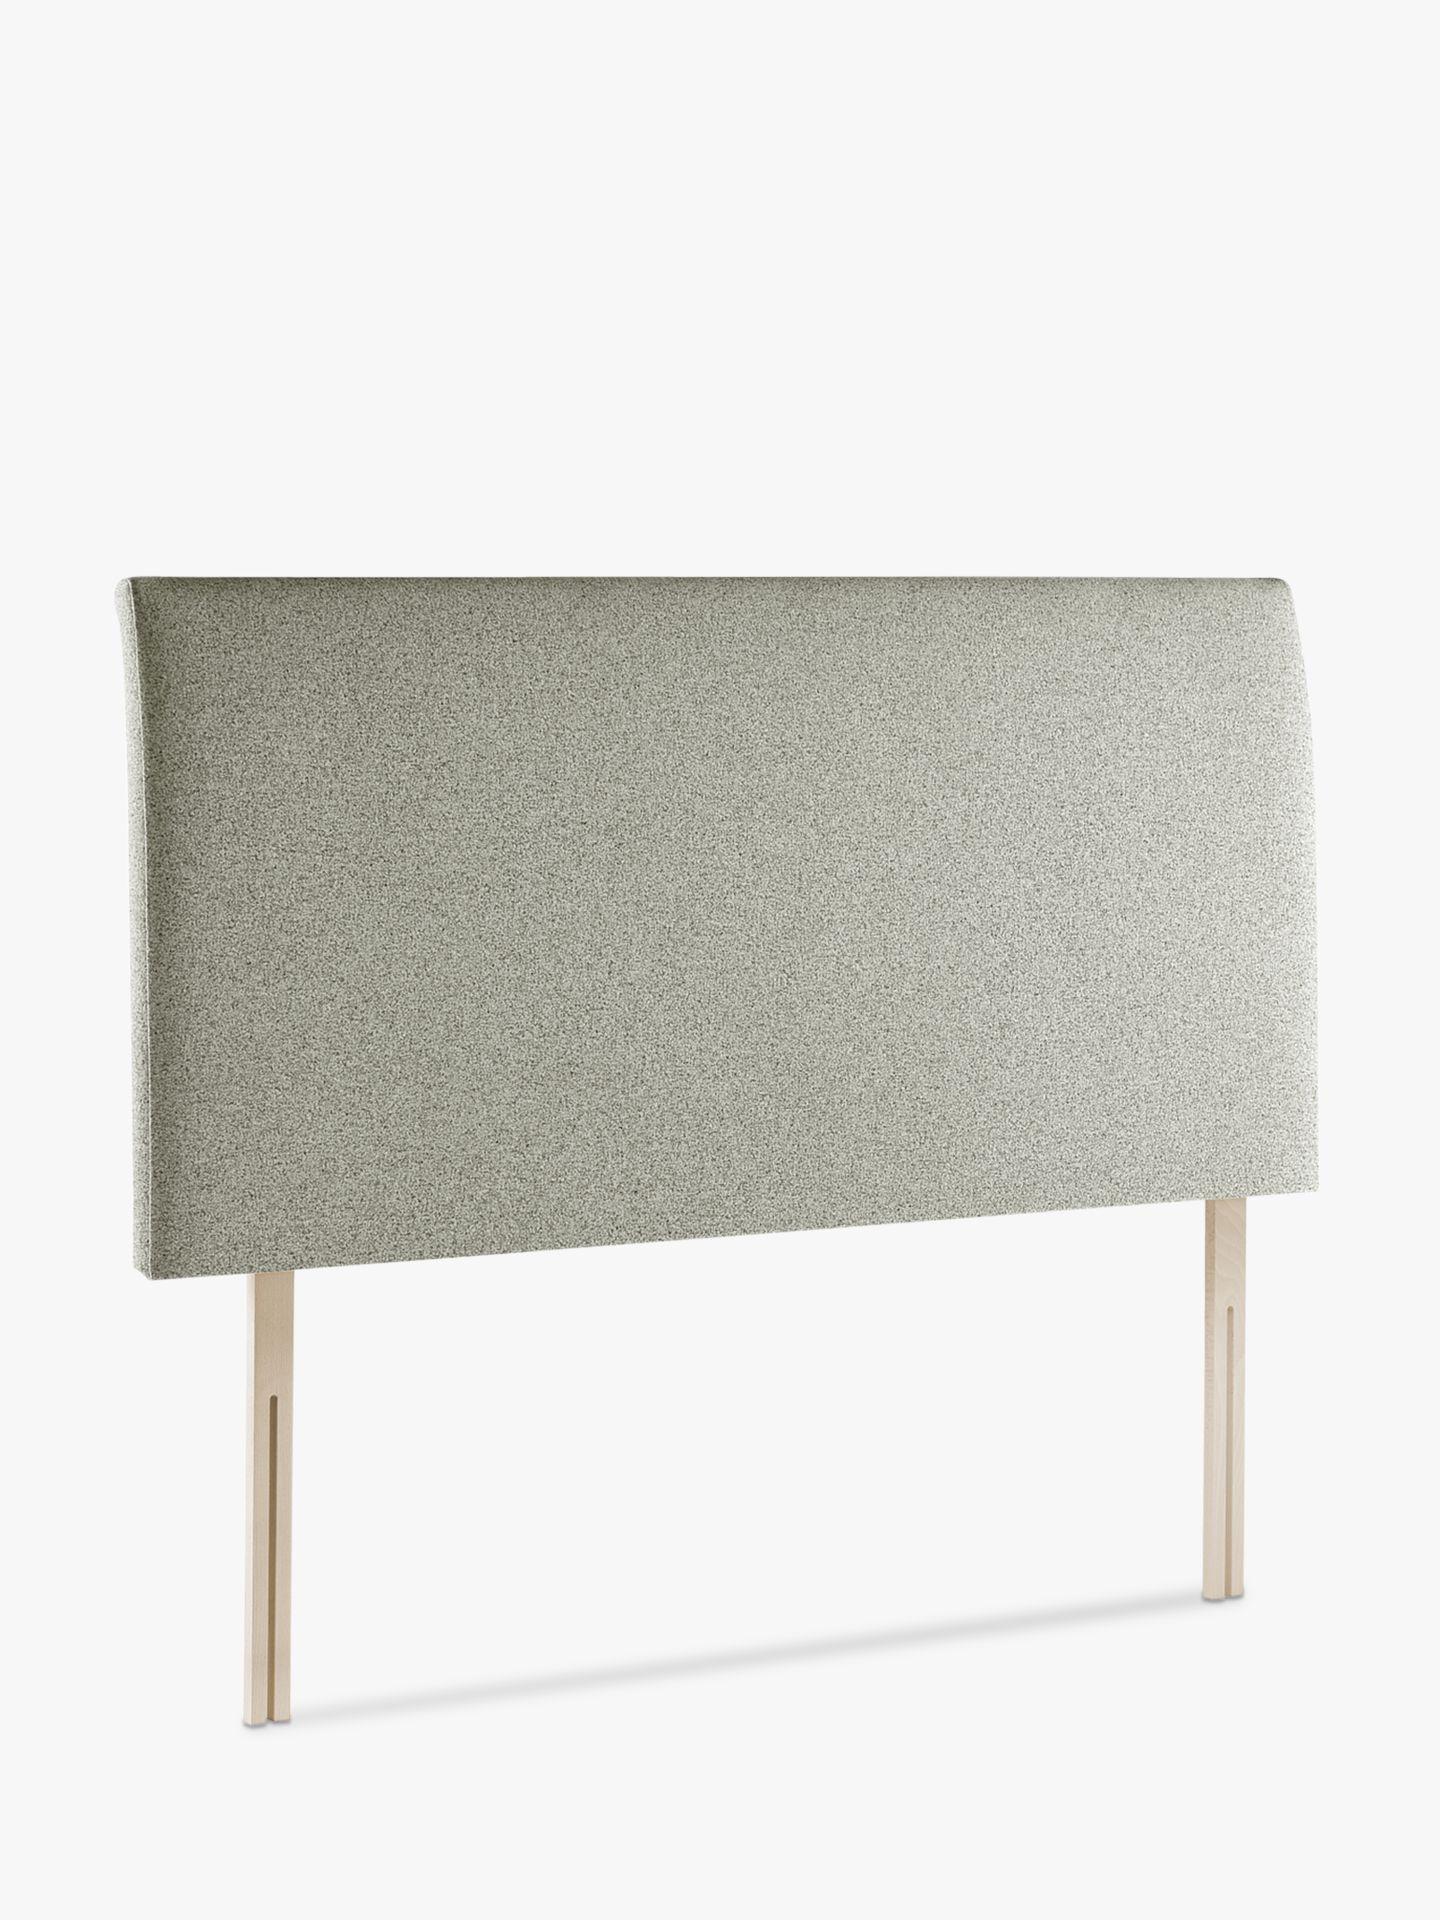 John Lewis & Partners Bedford Upholstered Headboard, Super King Size, FSC Certified (Softwood)